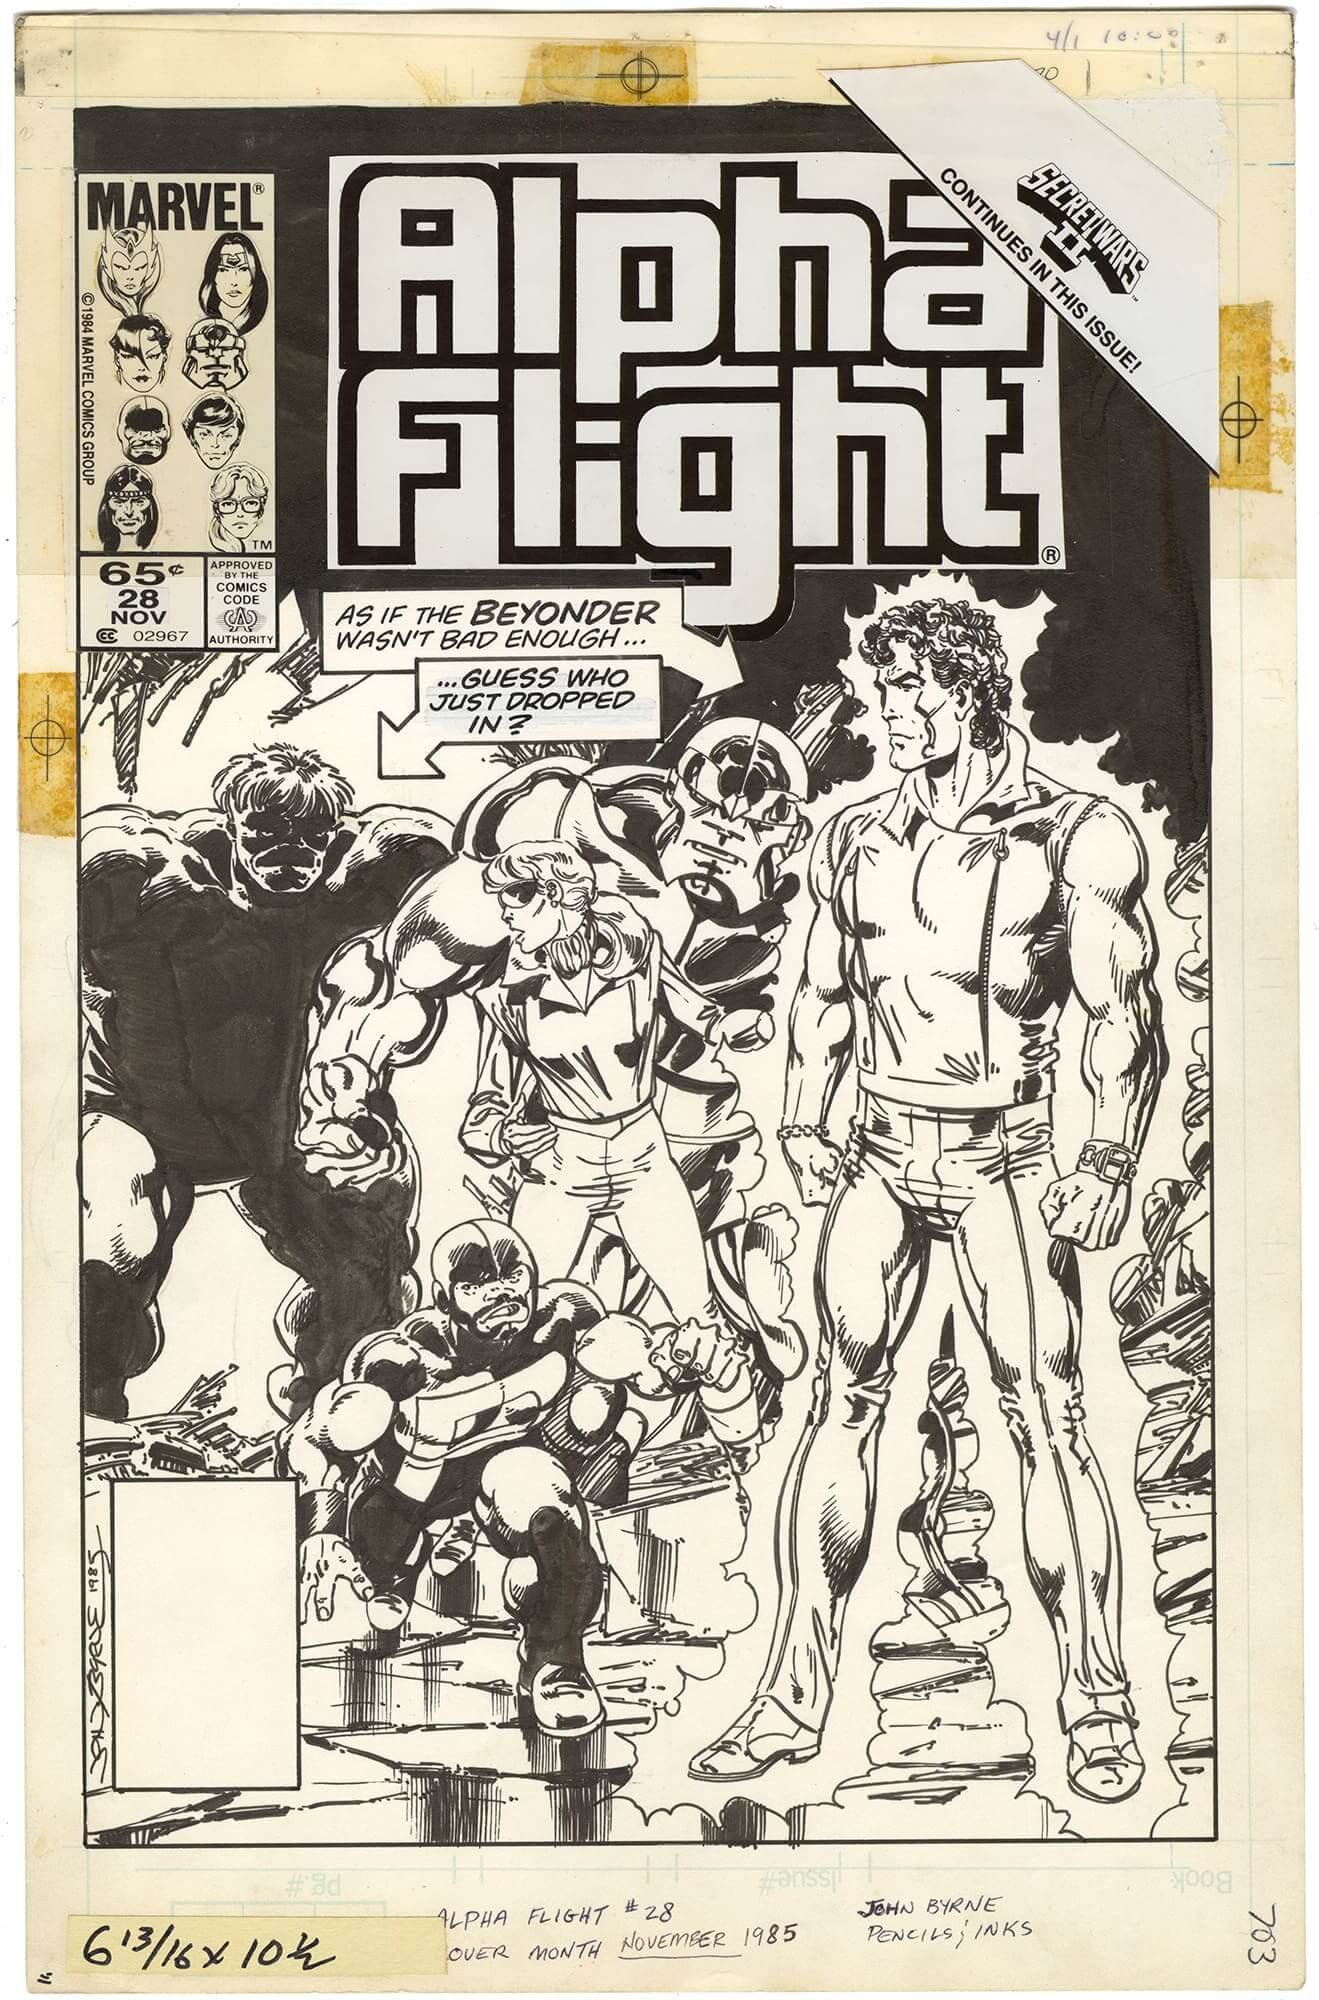 Alpha Flight #28 Cover